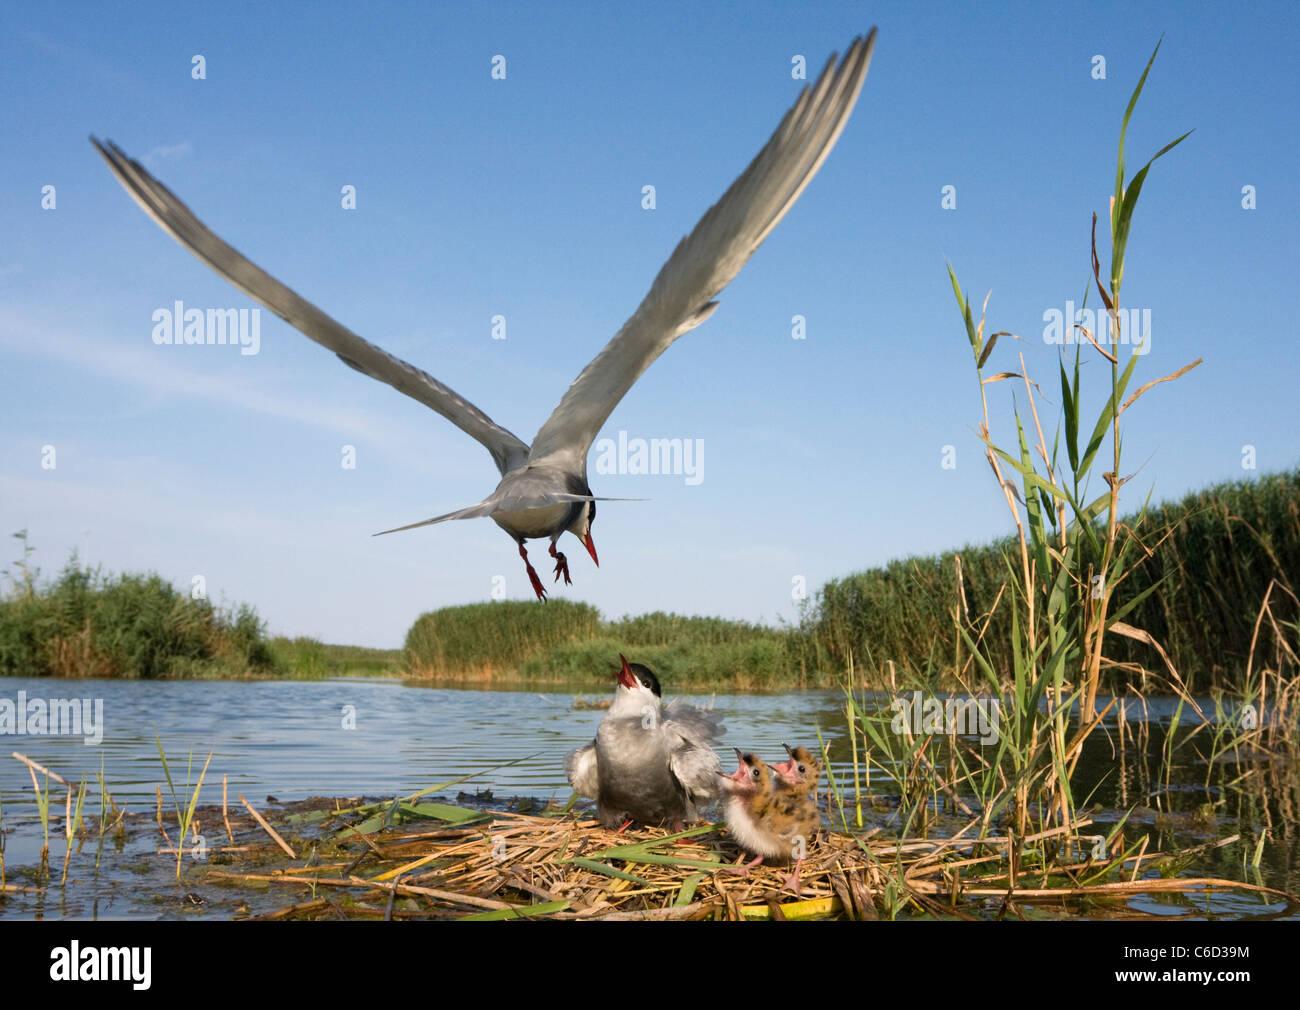 Whiskered tern, Chlidonias hybrida, feeding chicks at nest, Valencia, Spain - Stock Image